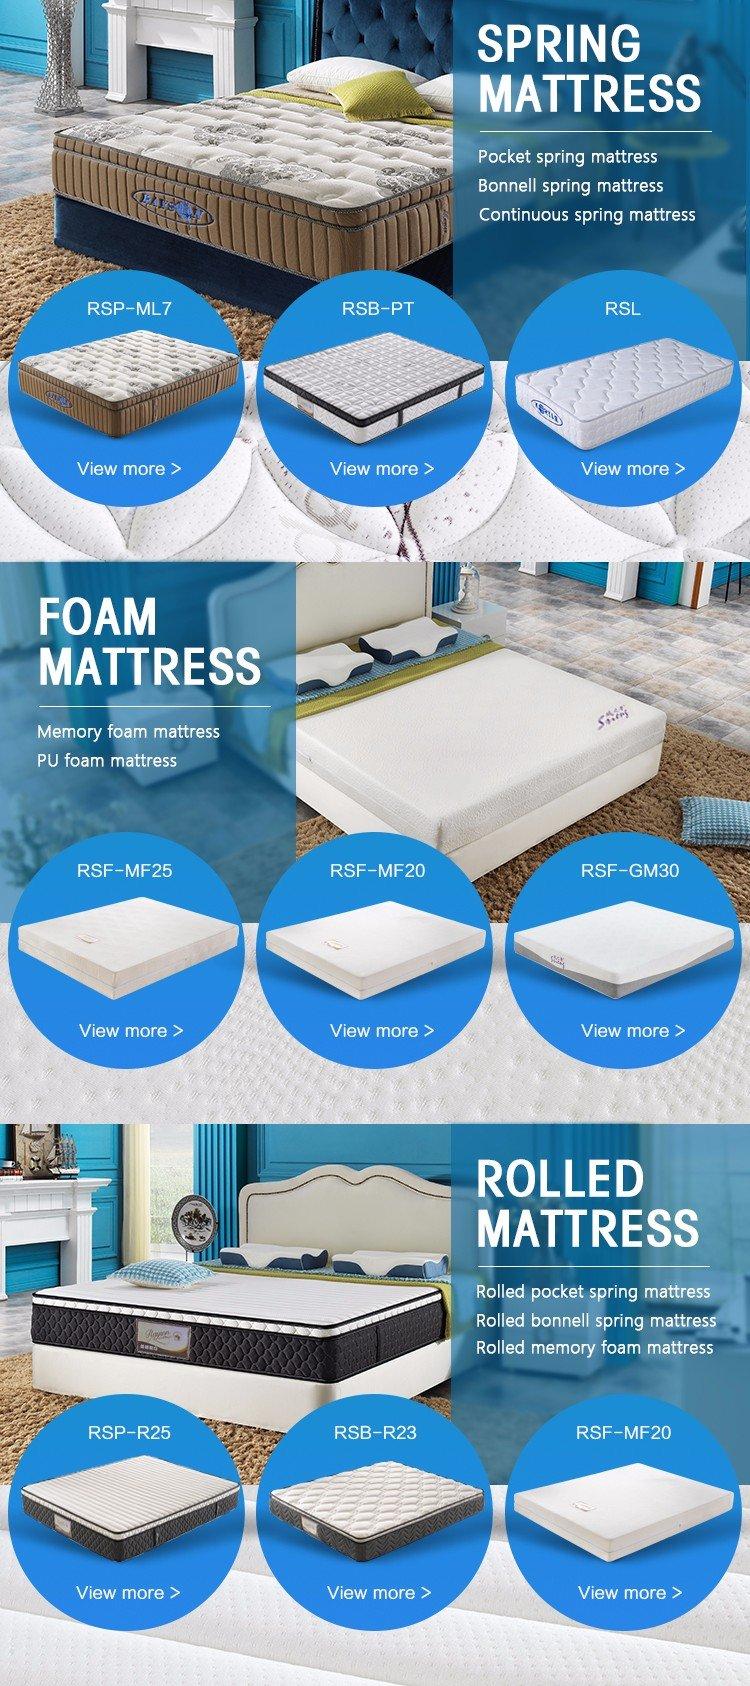 Rayson Mattress luxury spring koil mattress manufacturers-10